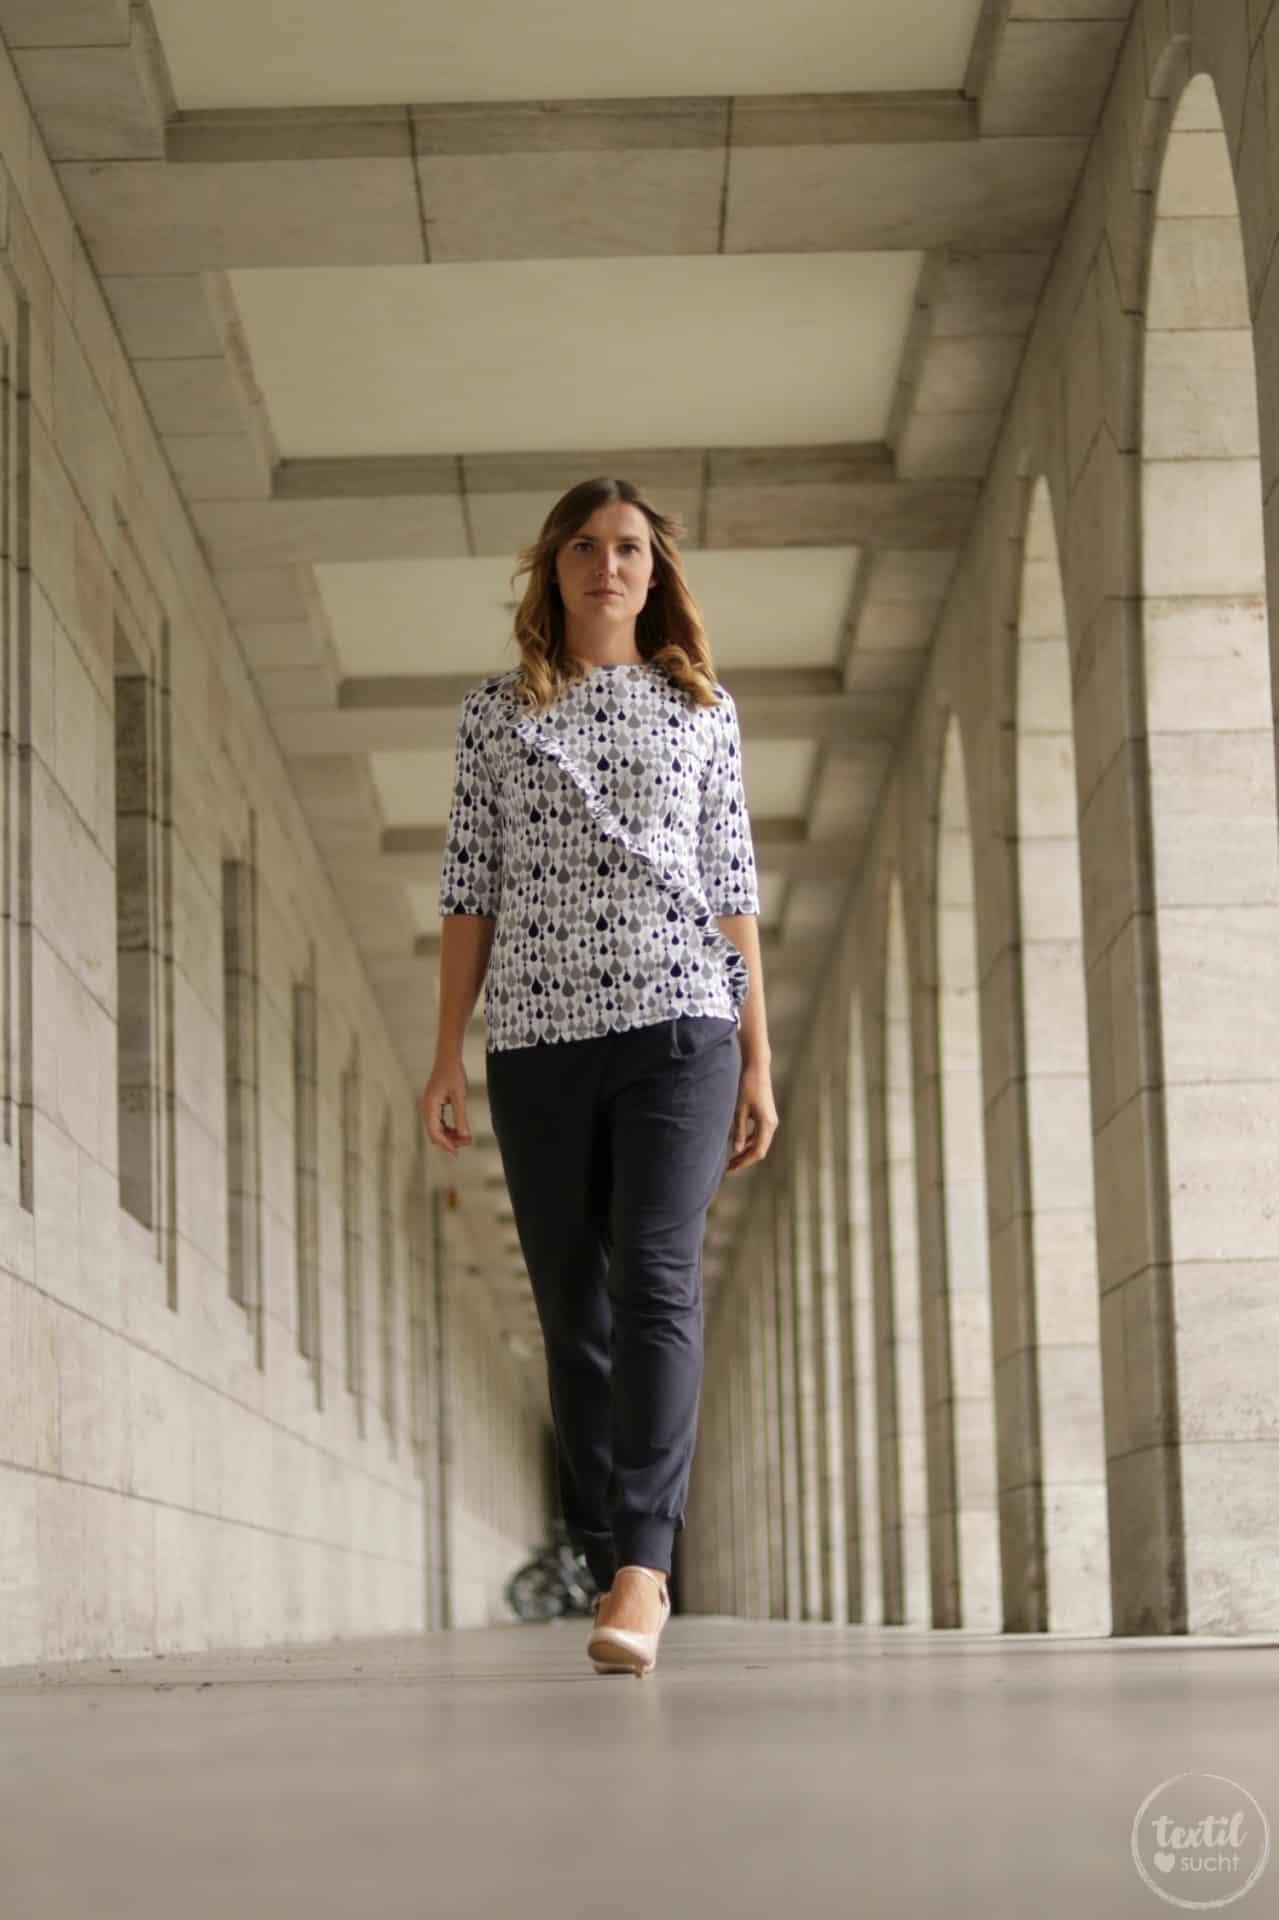 Schnittmuster kombinieren: Shirt Rüschli, Cardigan Lani und Hose Romana - Bild 9   textilsucht.de